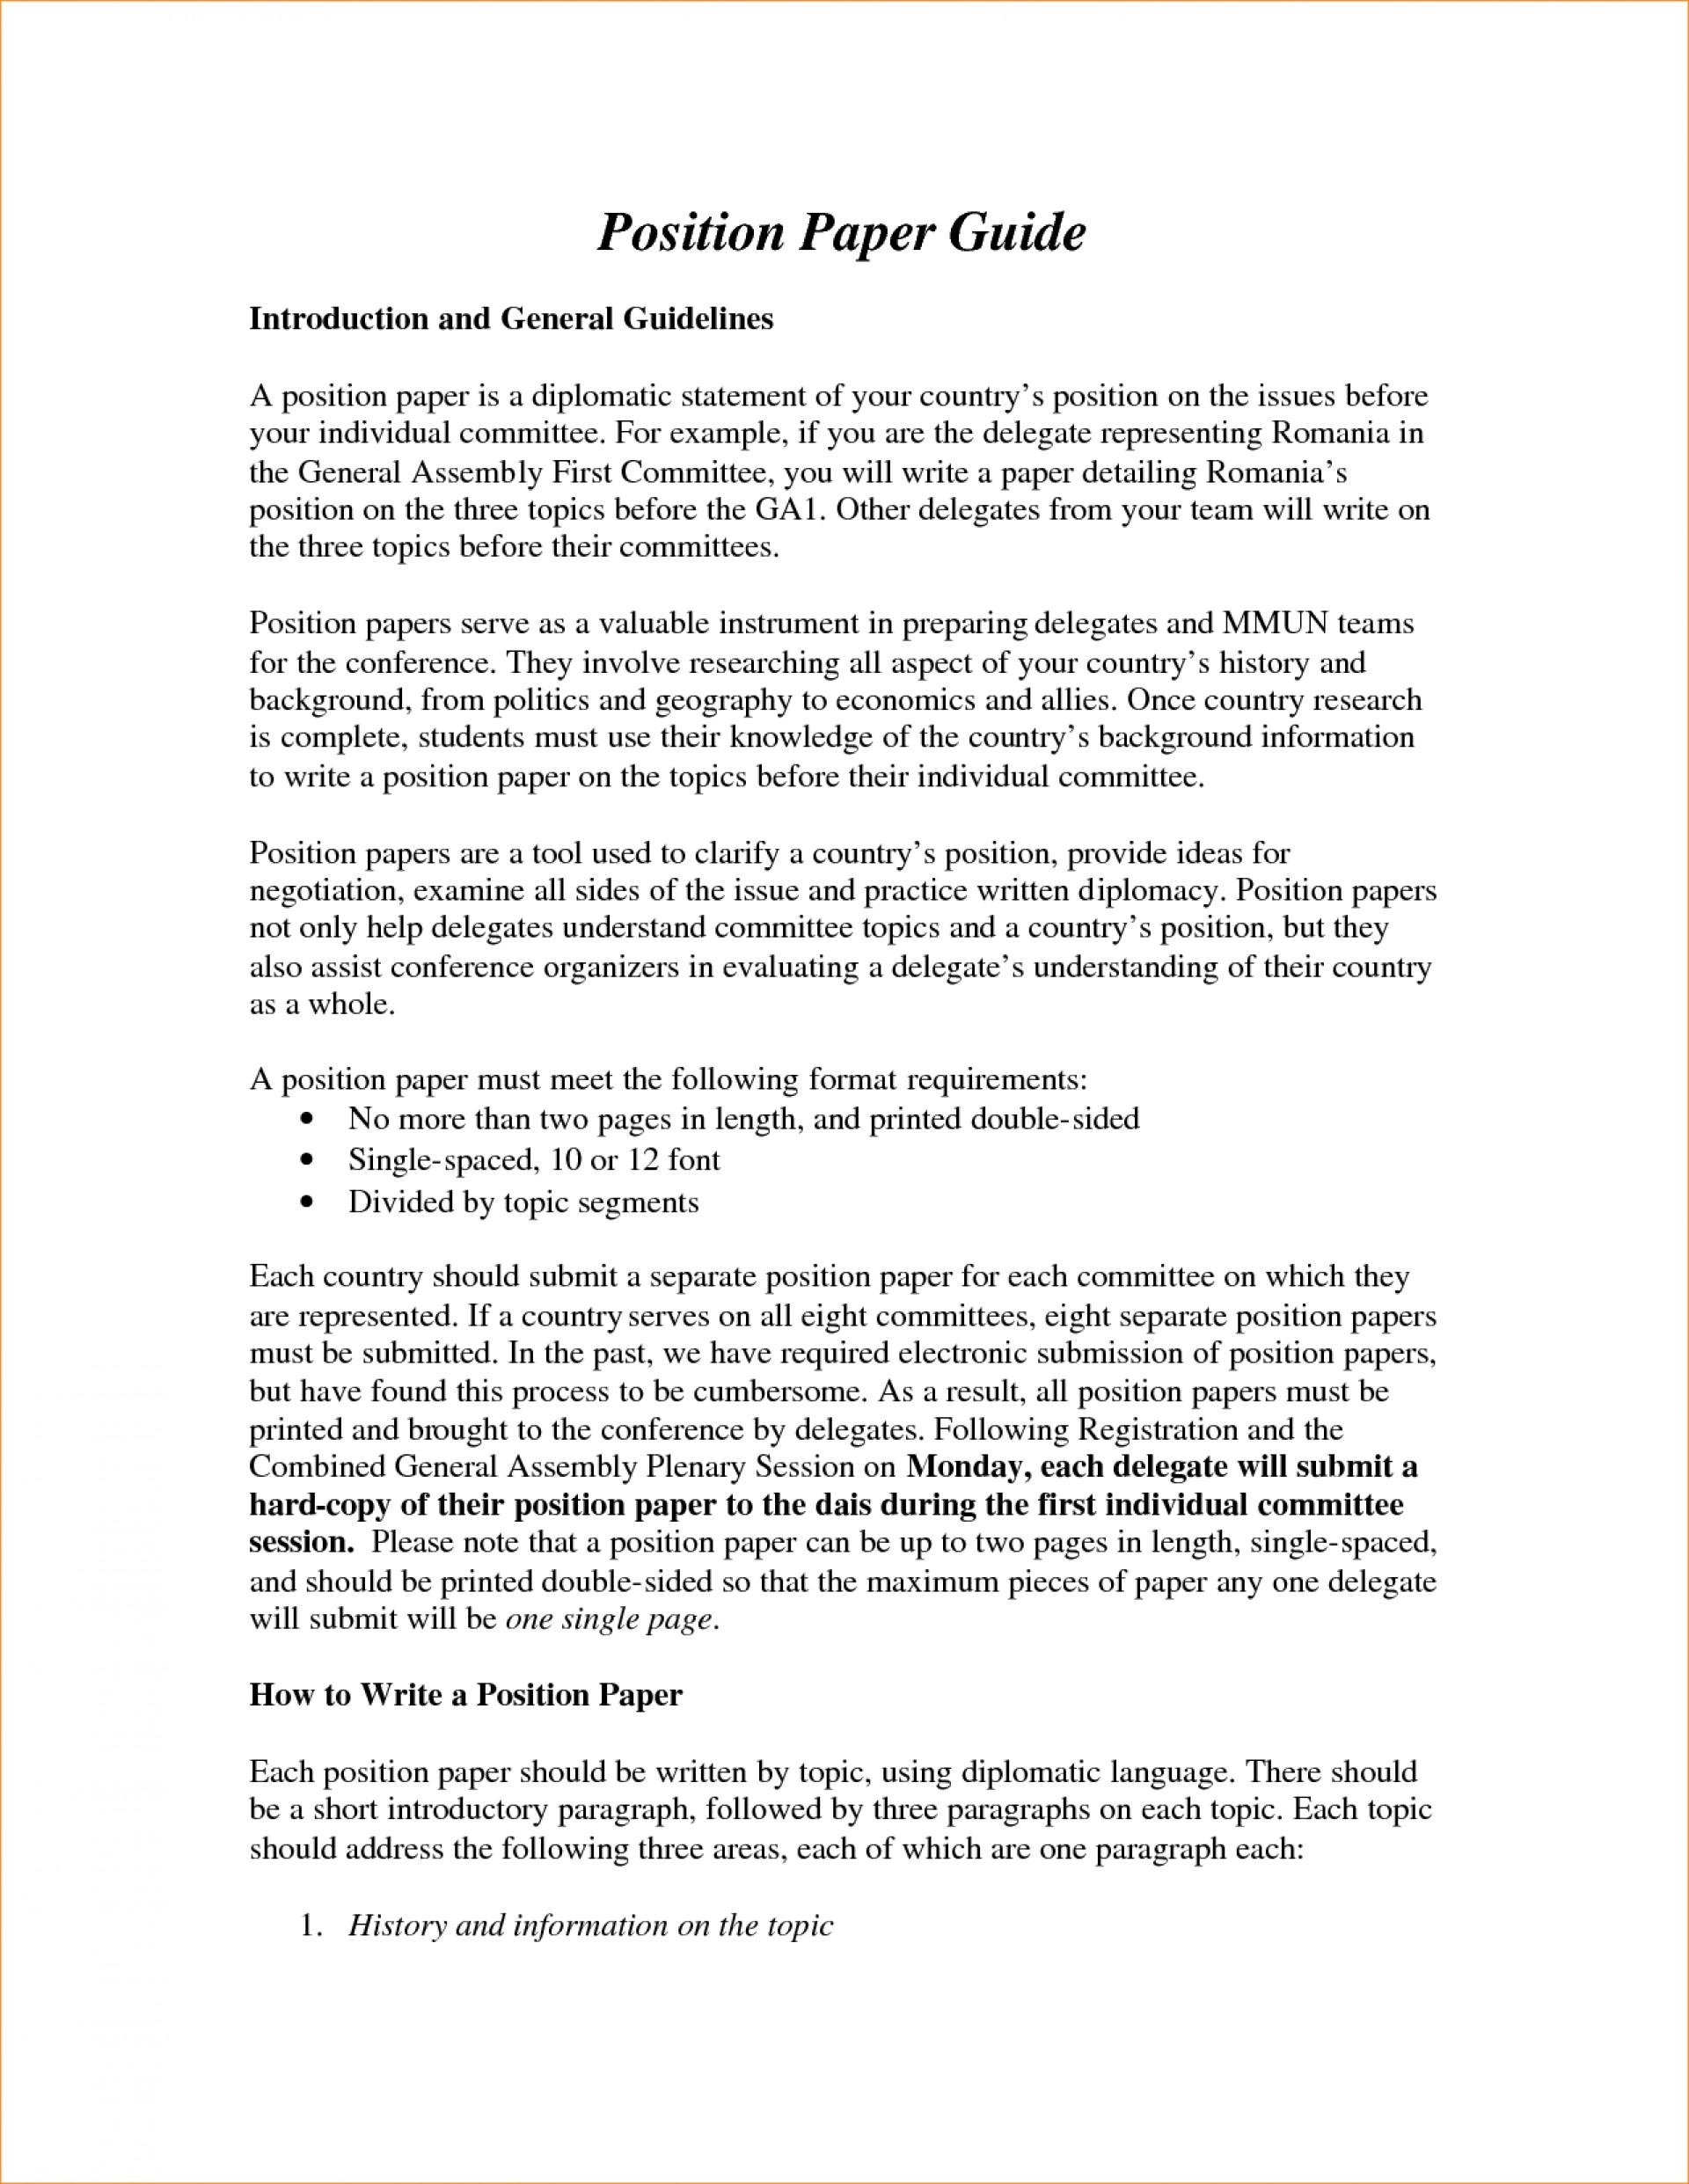 023 Essay Example Proposal Topic List University English Healthy Business Topics How To Write An Nb5h37b5f7xw28ltnfxgk76t4bzg97dp4nqwy8dfnvygyylamvsc766sm7xx47bnmnxw78dfnz5c98lqnr Exceptional Modest Conclusion Prompts 1920